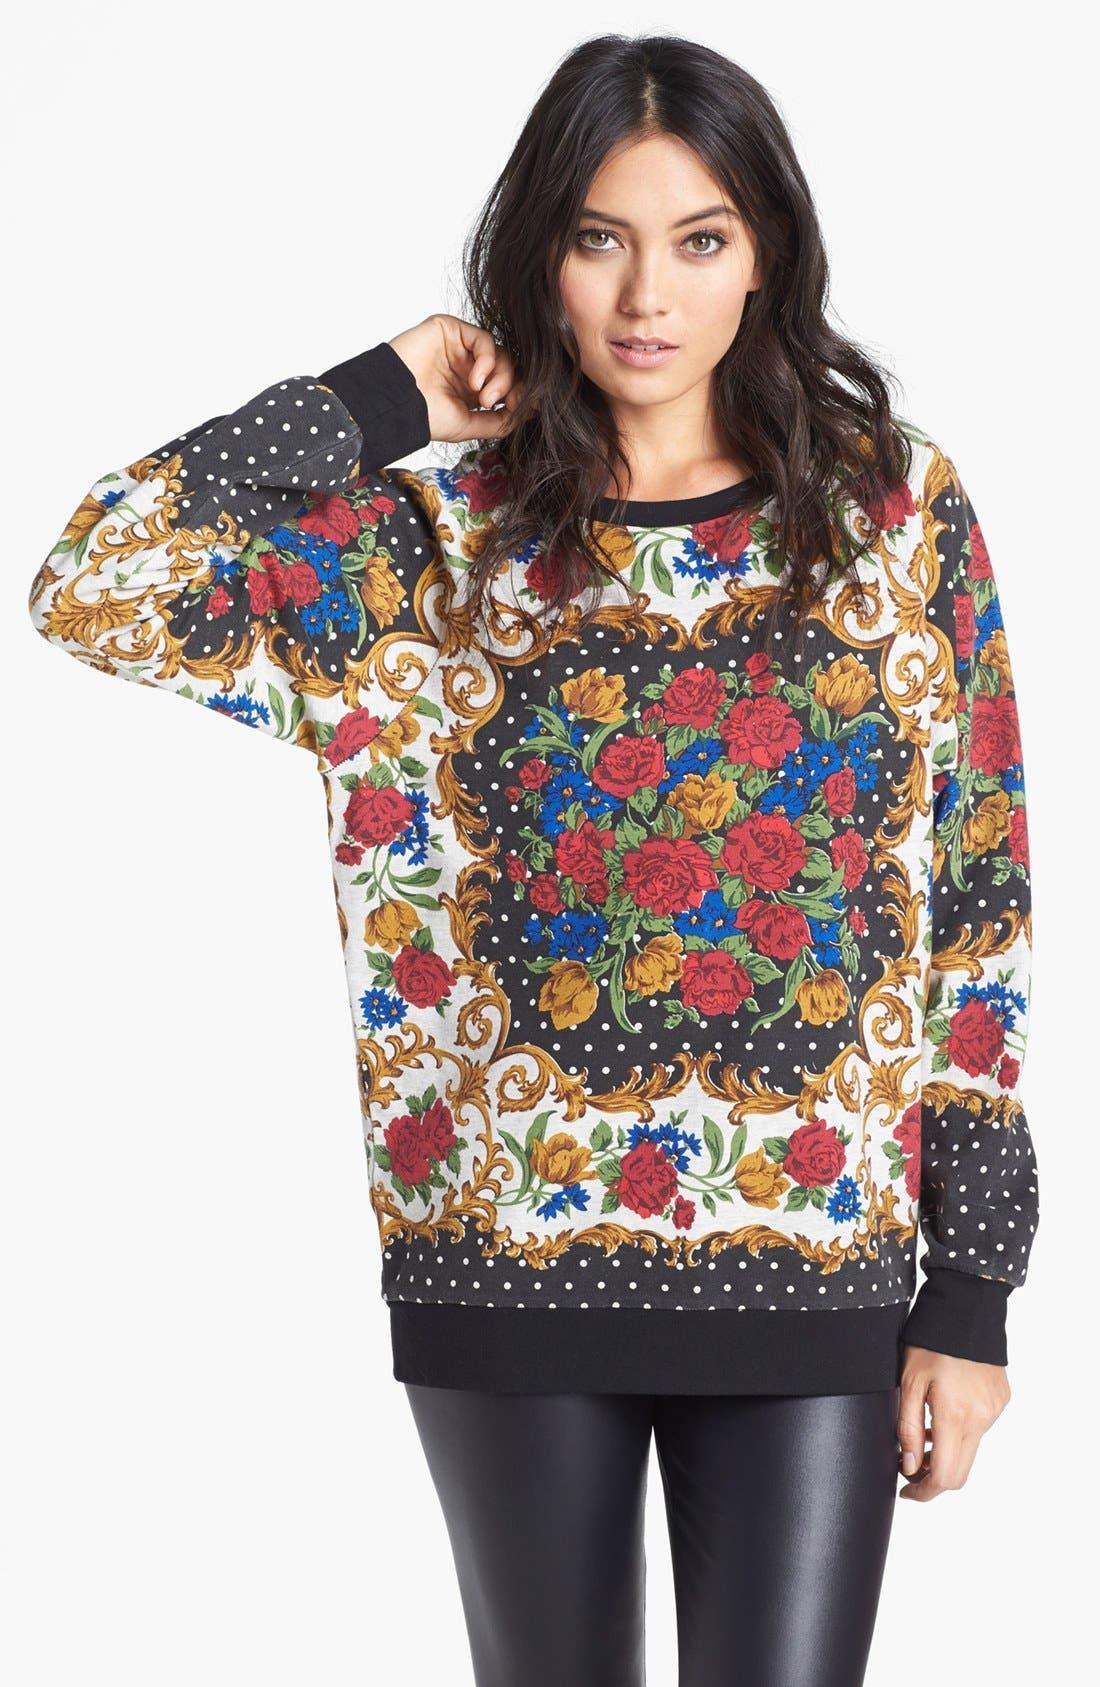 Alternate Image 1 Selected - MINKPINK 'Excessive' Sweatshirt